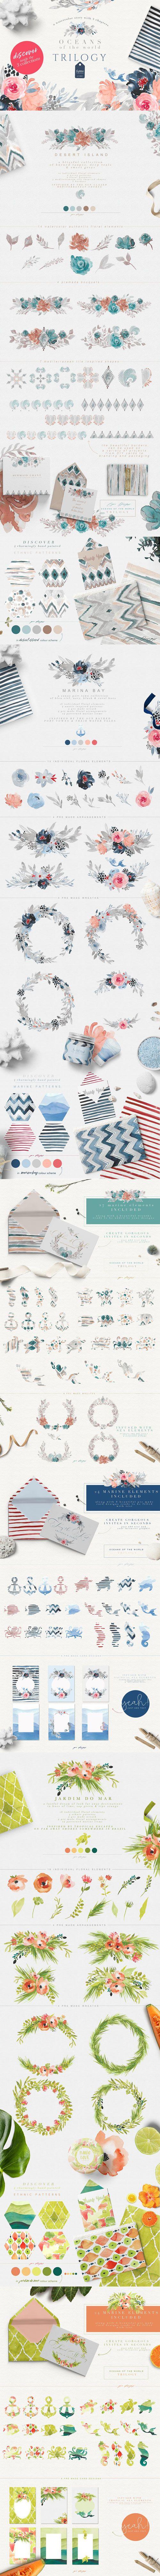 #Oceans of the World #Watercolor Trilogy Set! ( #vector #illustrations #wedding #art #decor #branding #creative #printable )